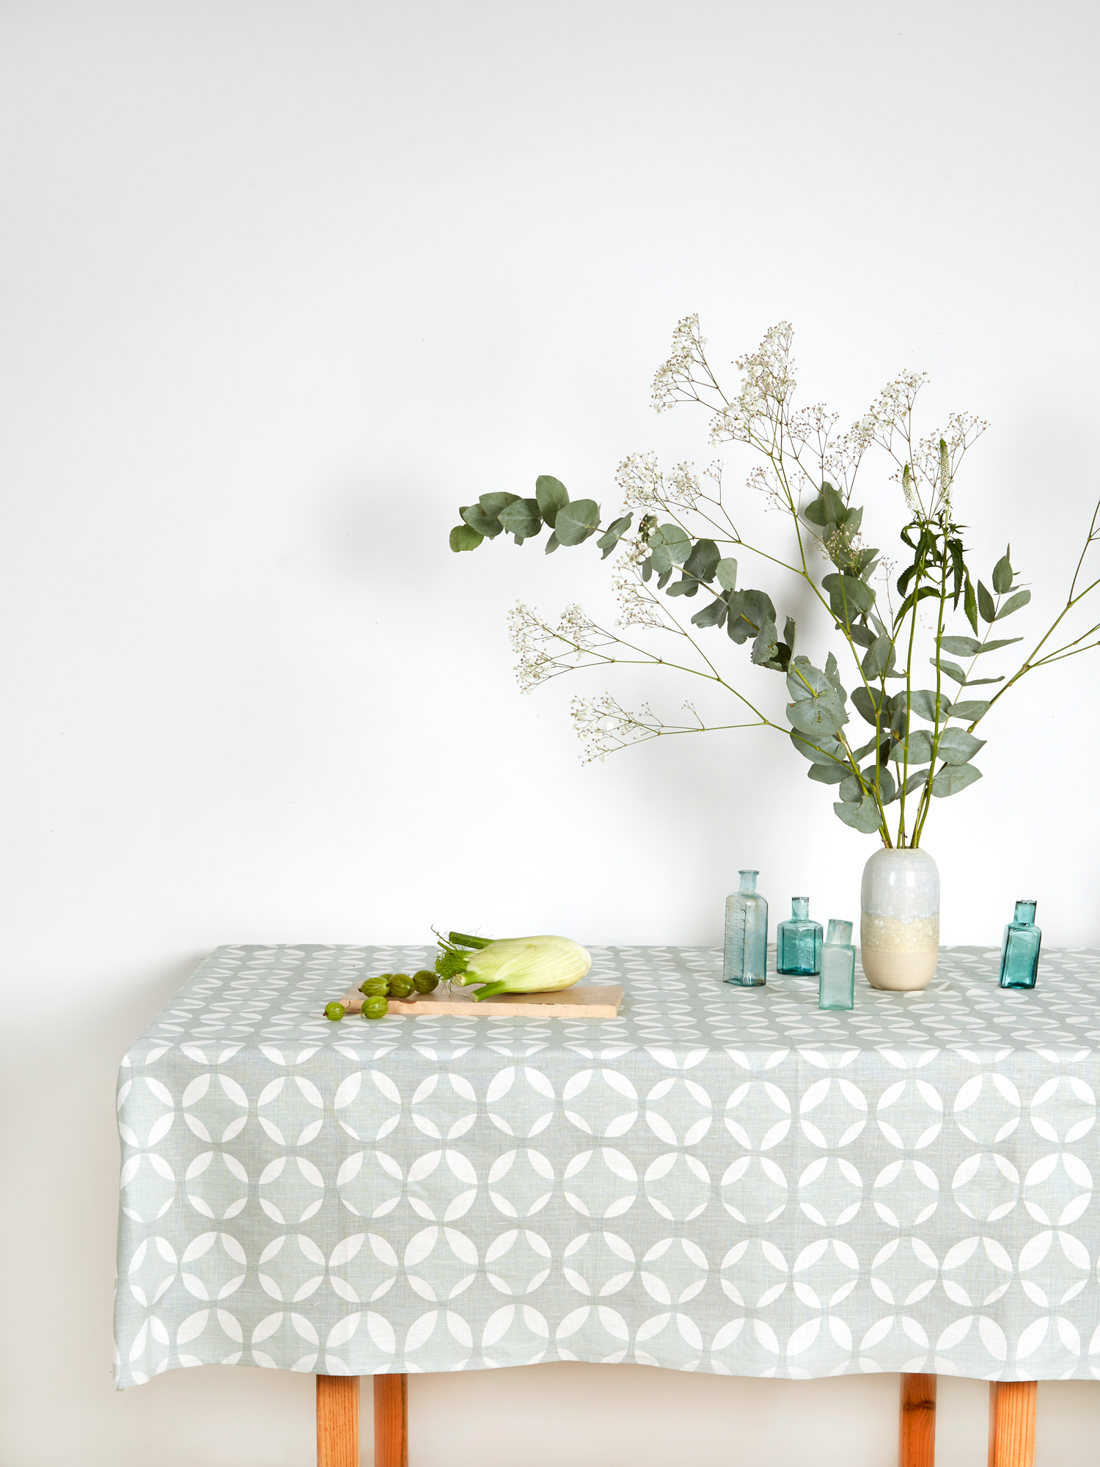 Georgia-Bosson_tablecloth_es.jpg